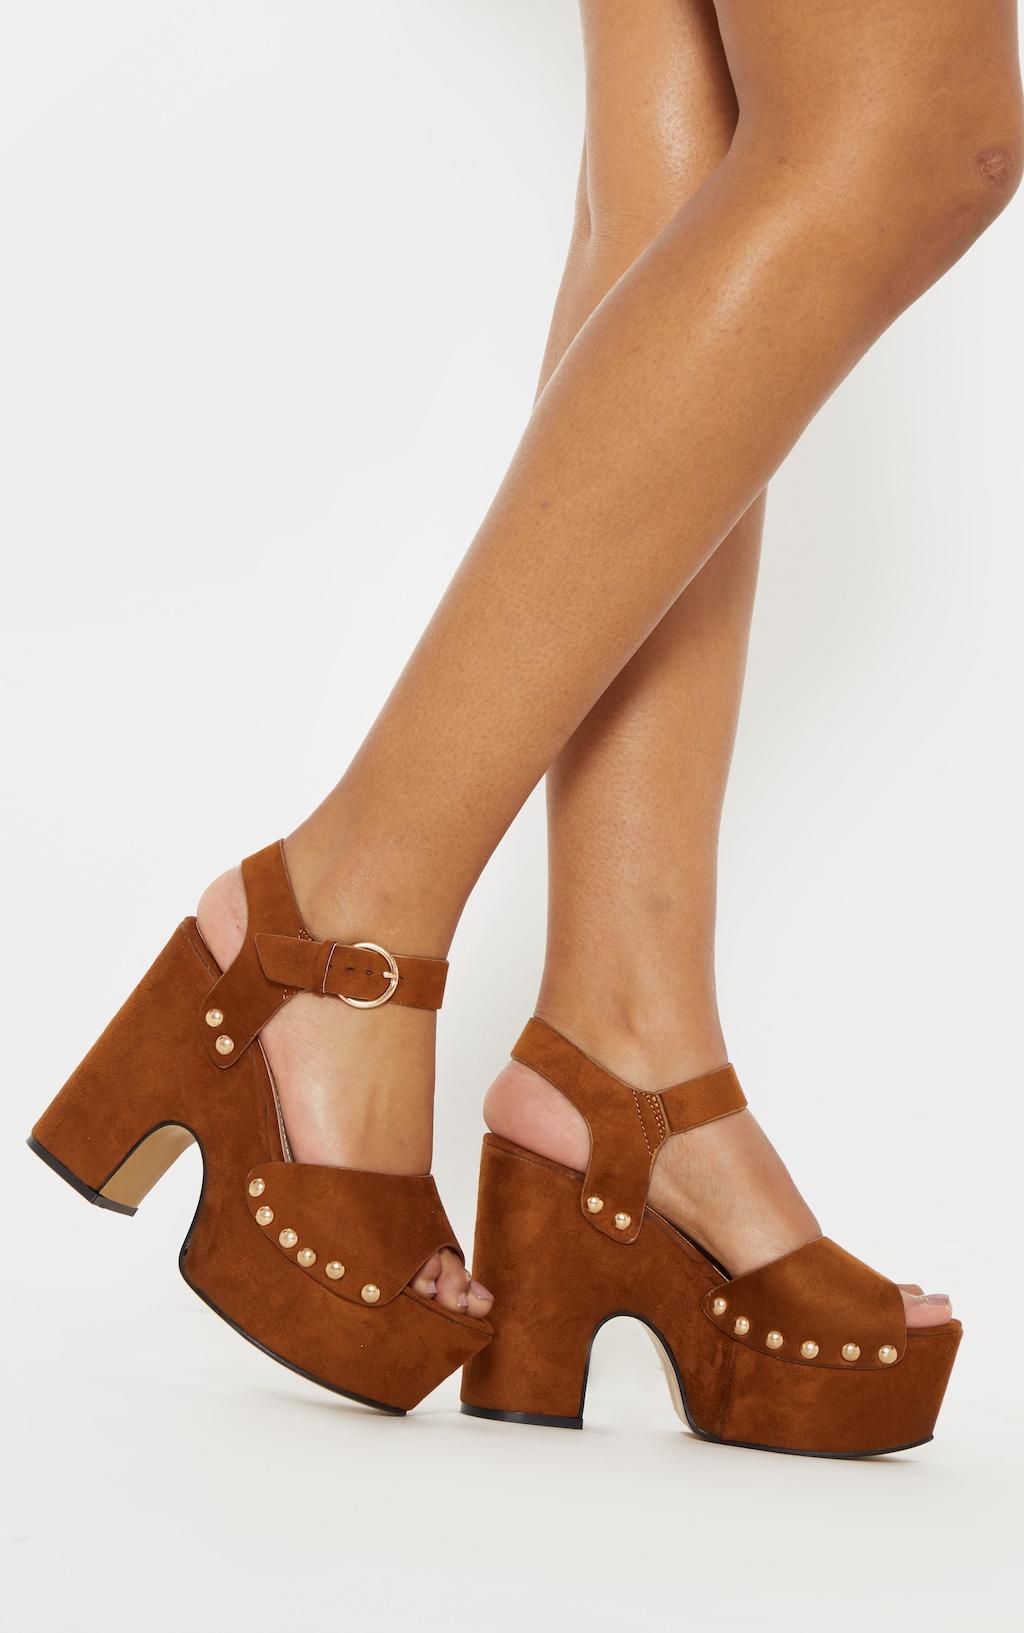 9ee25e15a5 Tan Studded Platform Sandal | Shoes | PrettyLittleThing